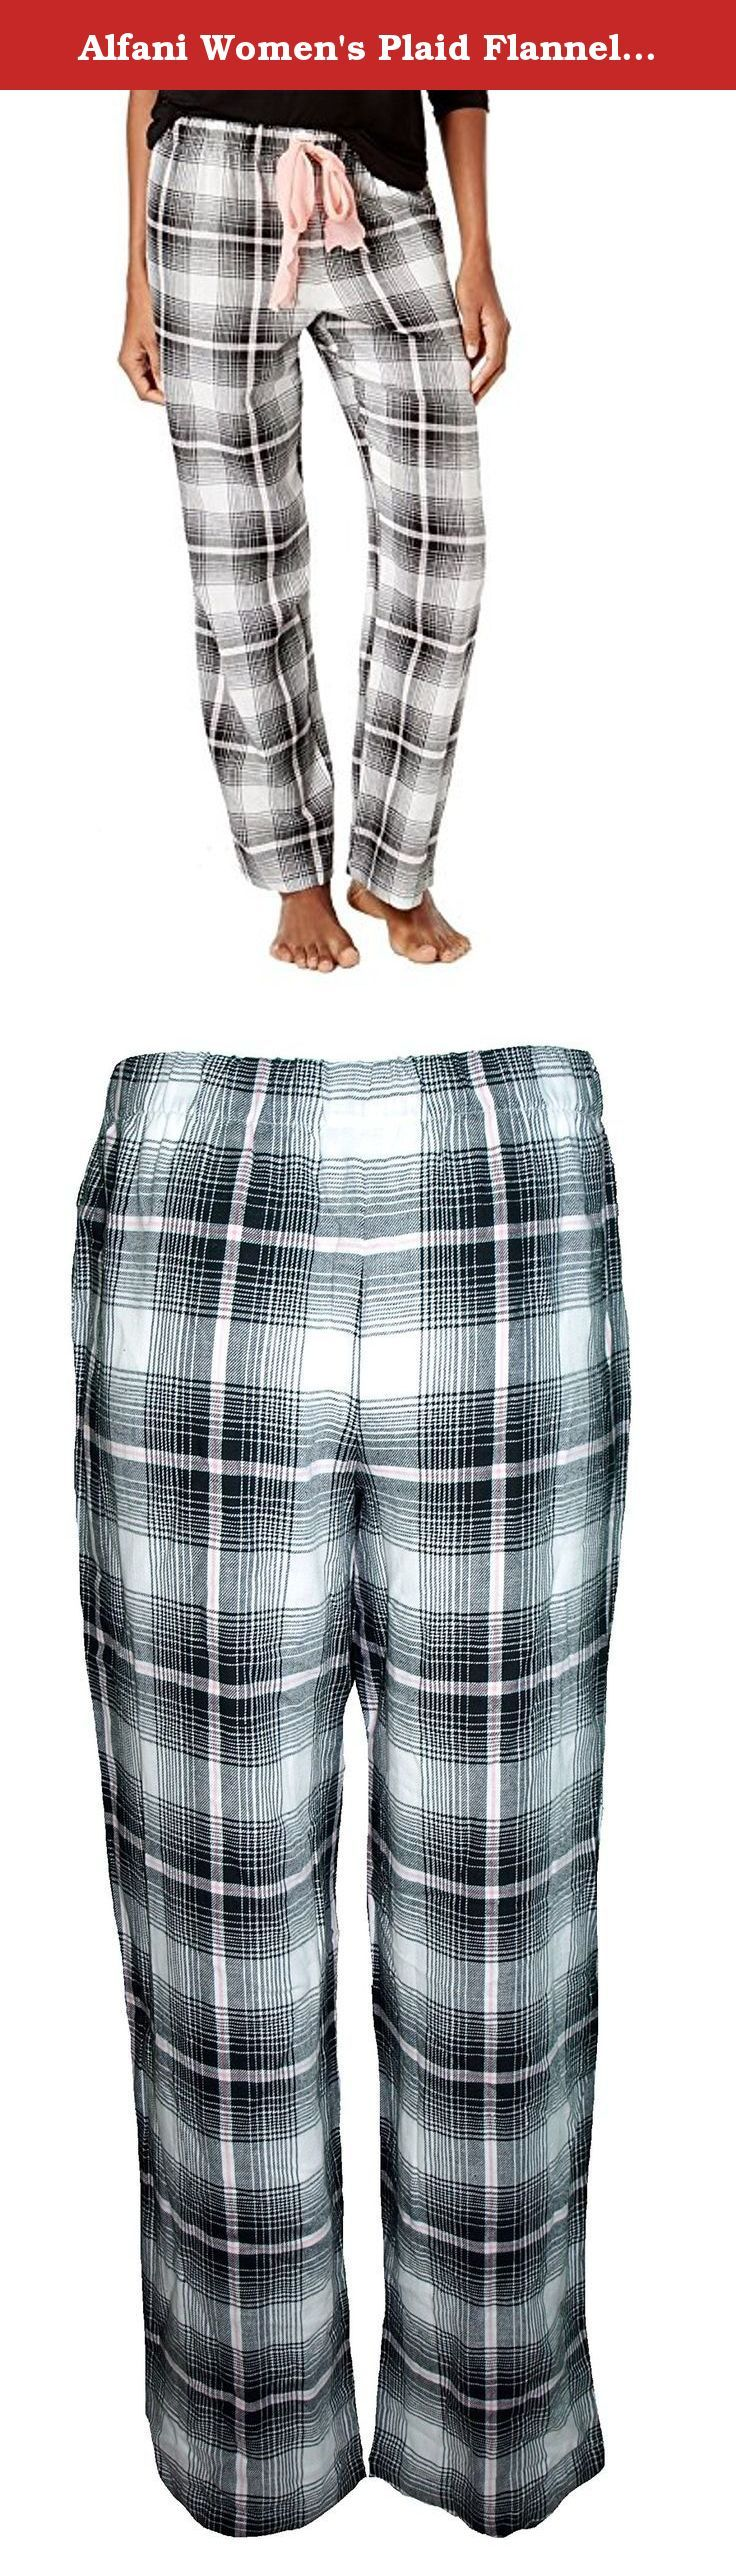 Alfani Women's Plaid Flannel Pajama Pants (S). Alfani Small Blue Combo Plaid Flannel Pajama Pants for Women.